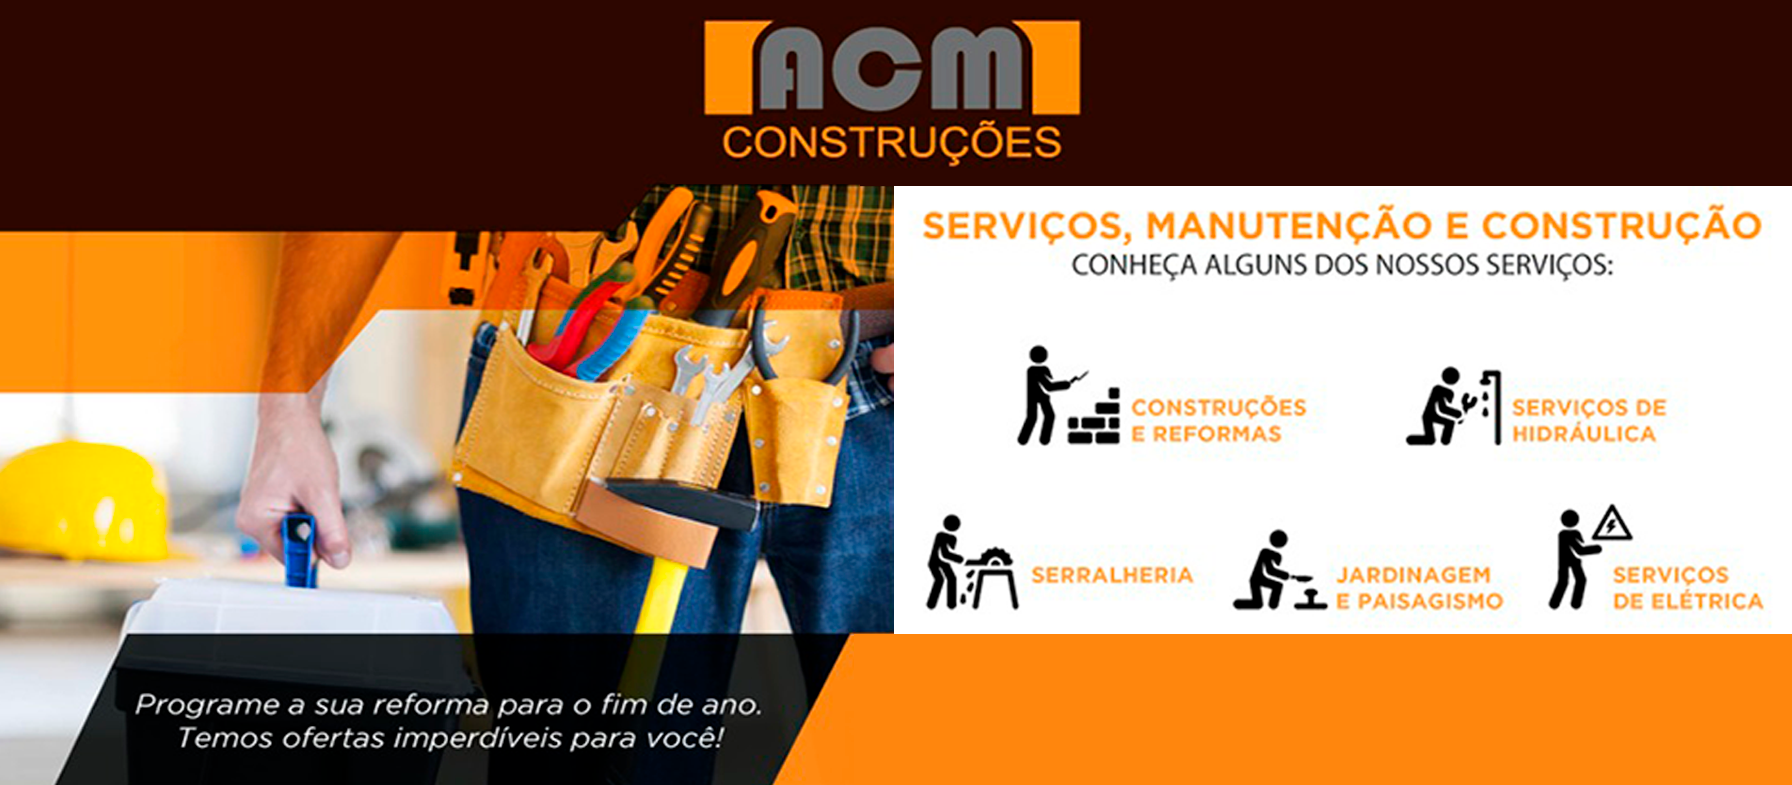 ACM CONSTRUÇÕES SITE.png